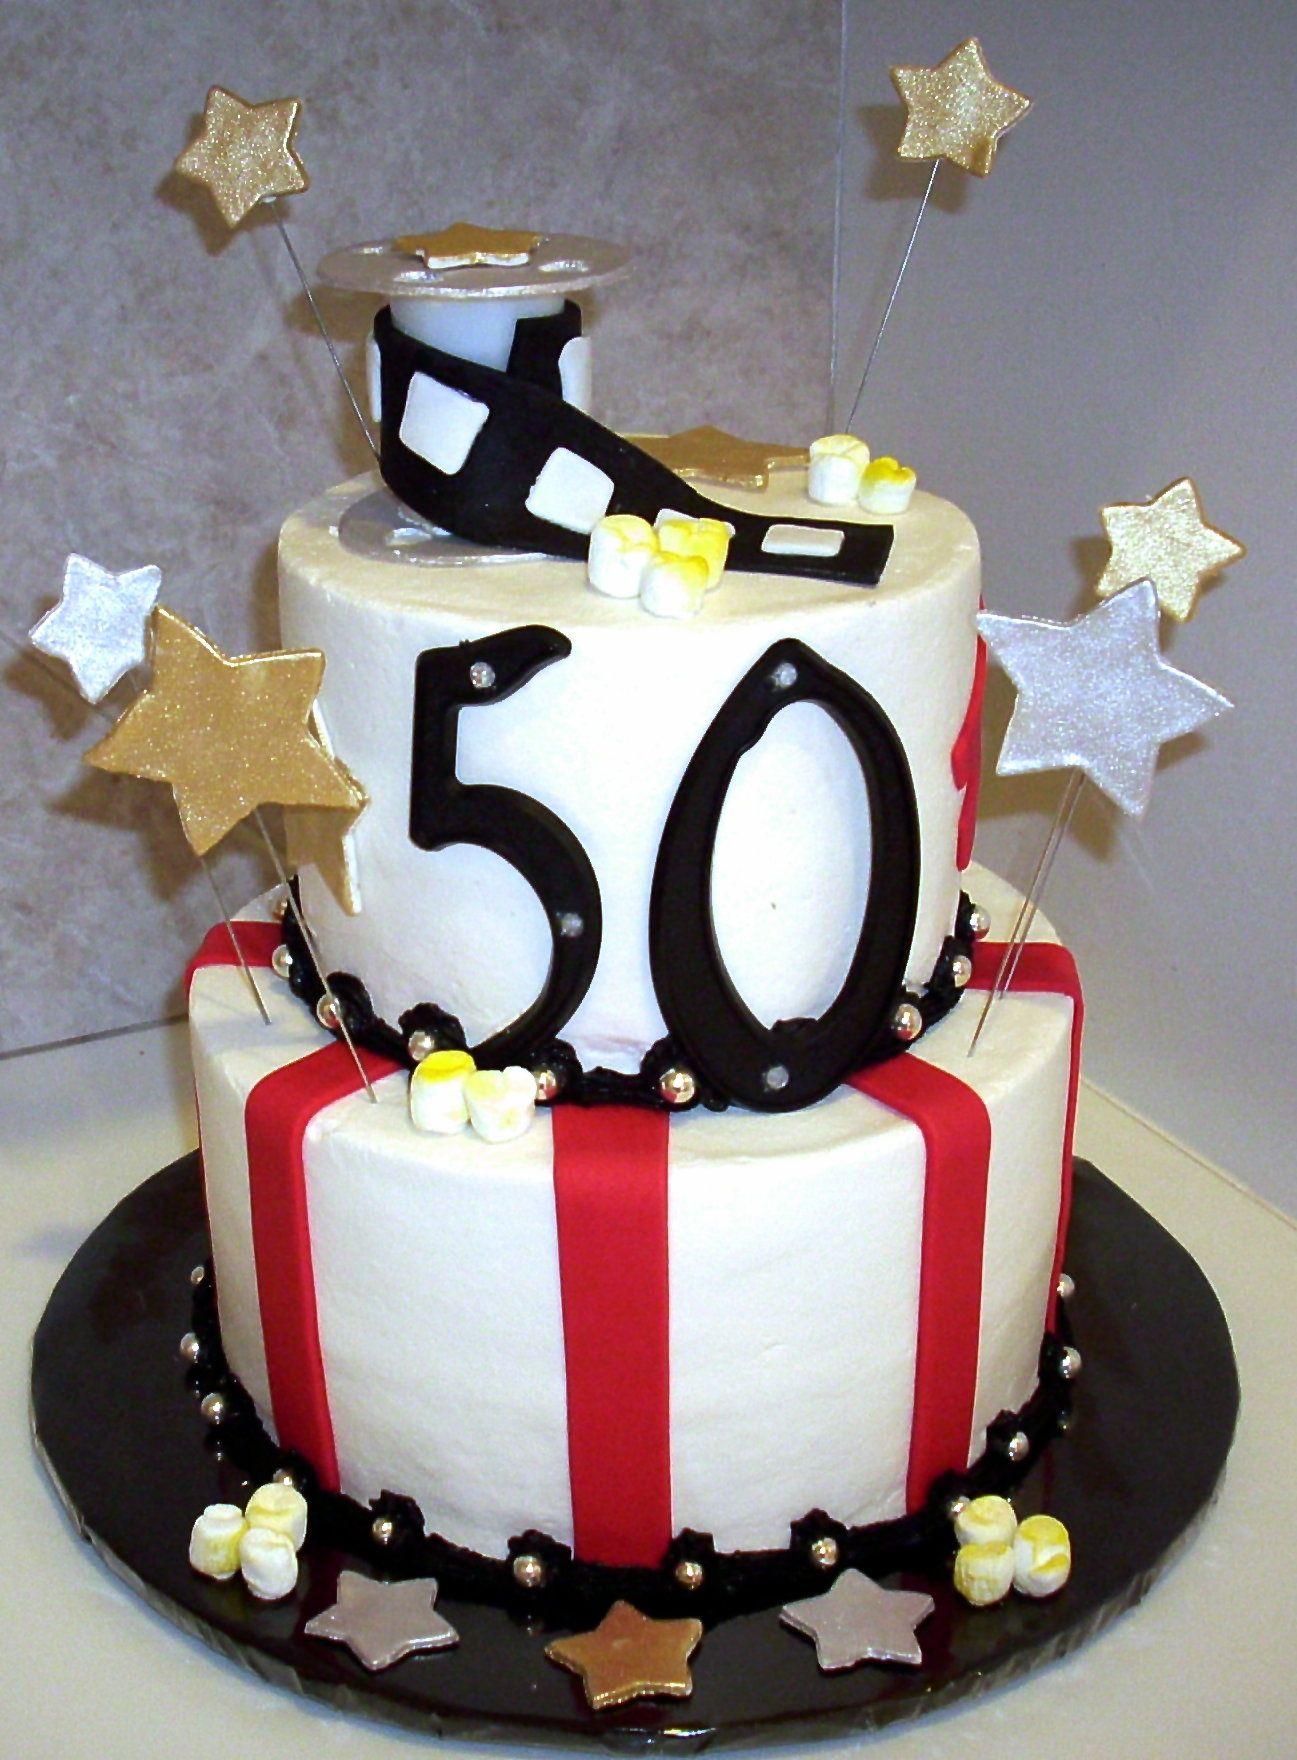 Pin on Cake Decorating